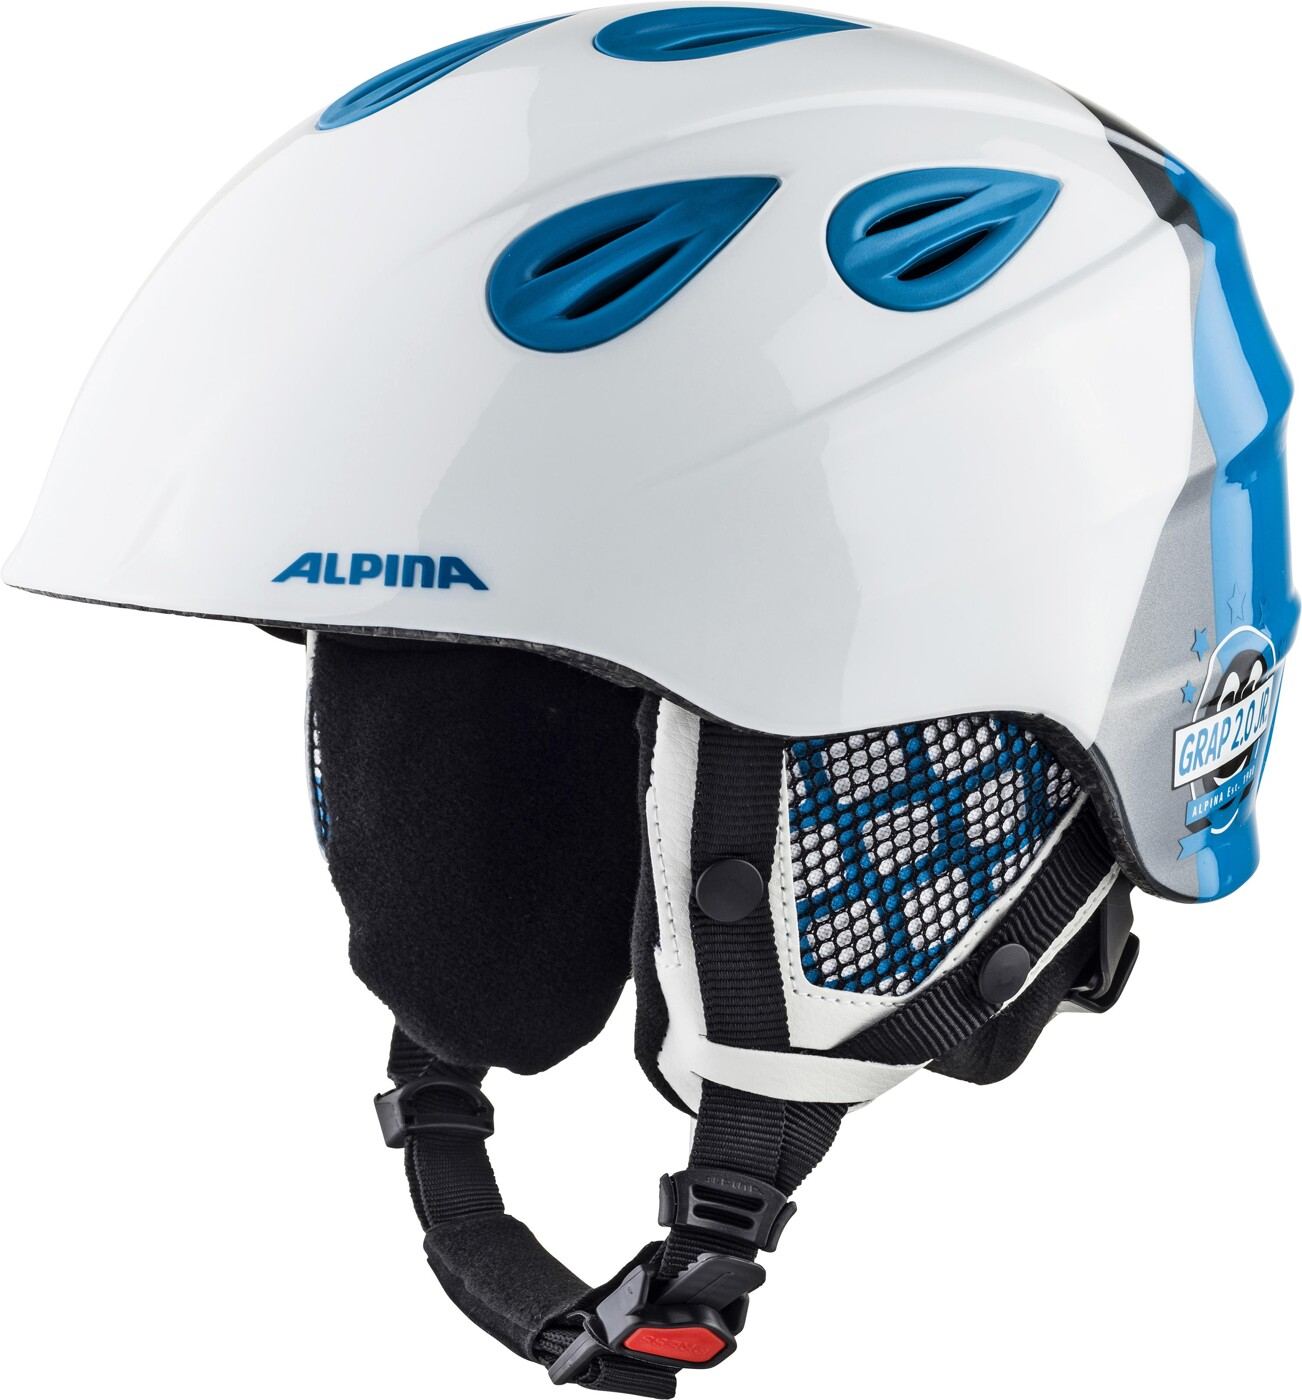 ALPINA Grap 2.0 Jr. blue-neon-yellow 54-57